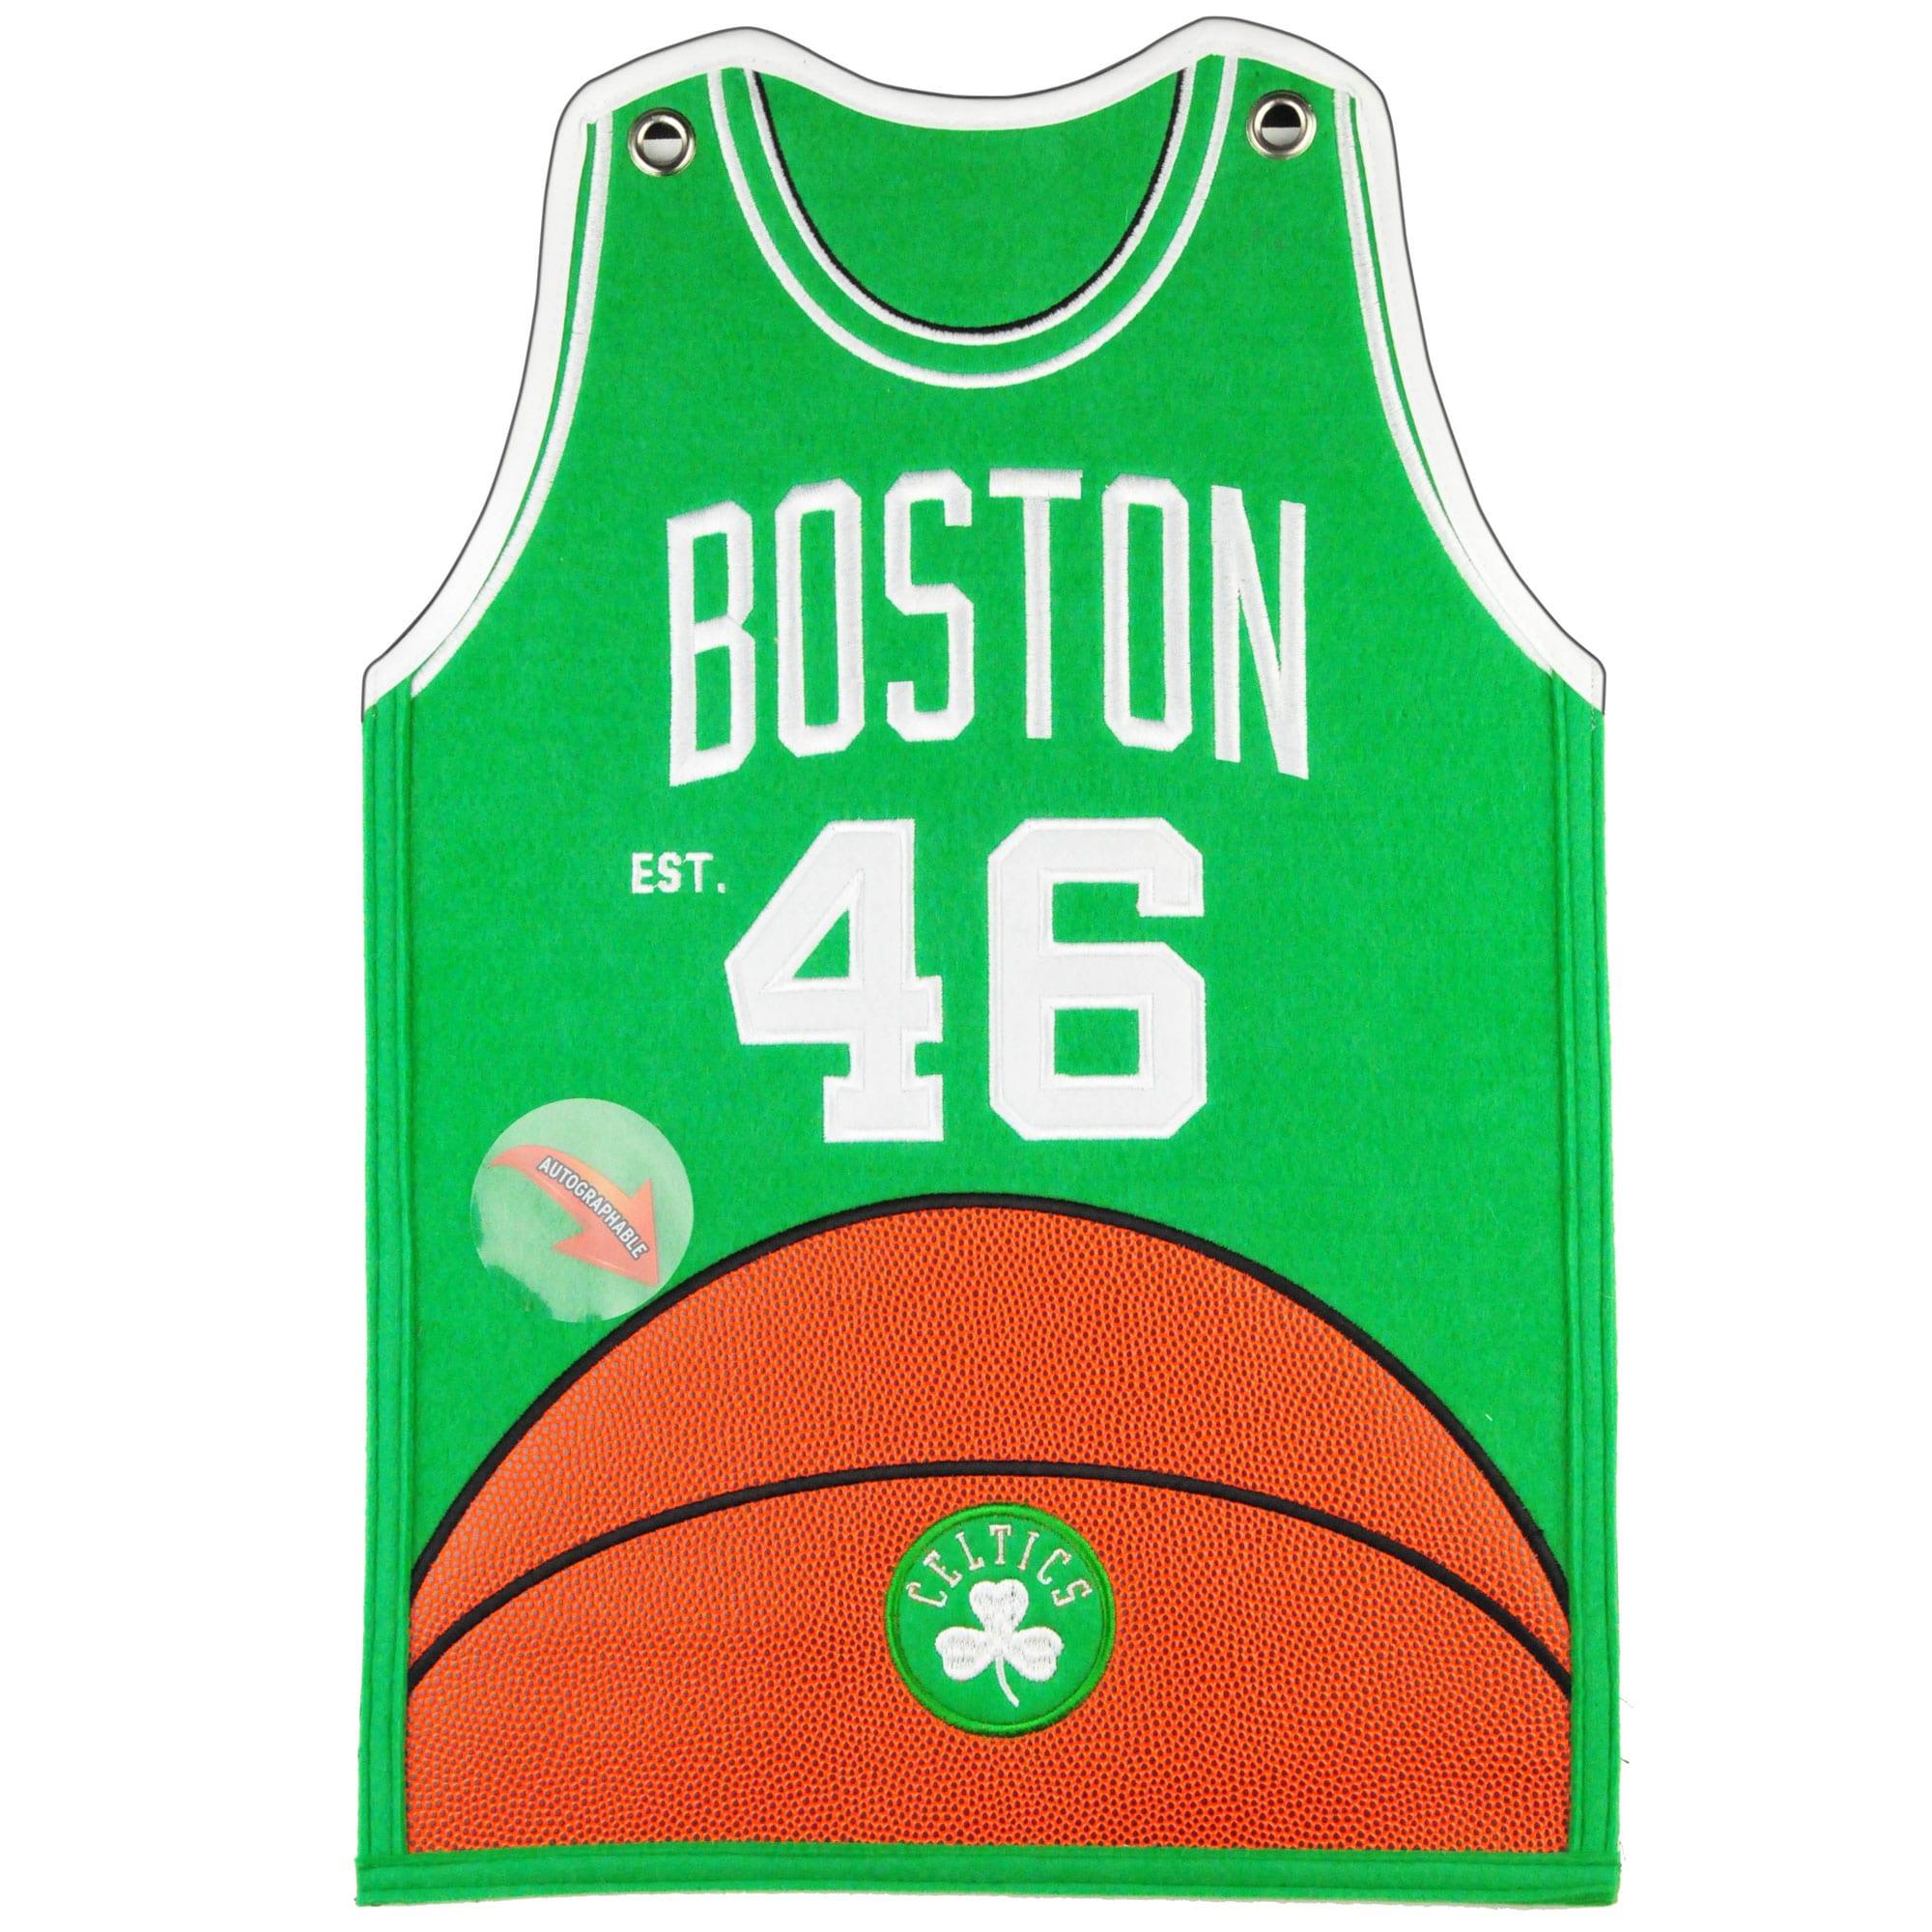 Boston Celtics 20'' x 18'' Jersey Traditions Banner